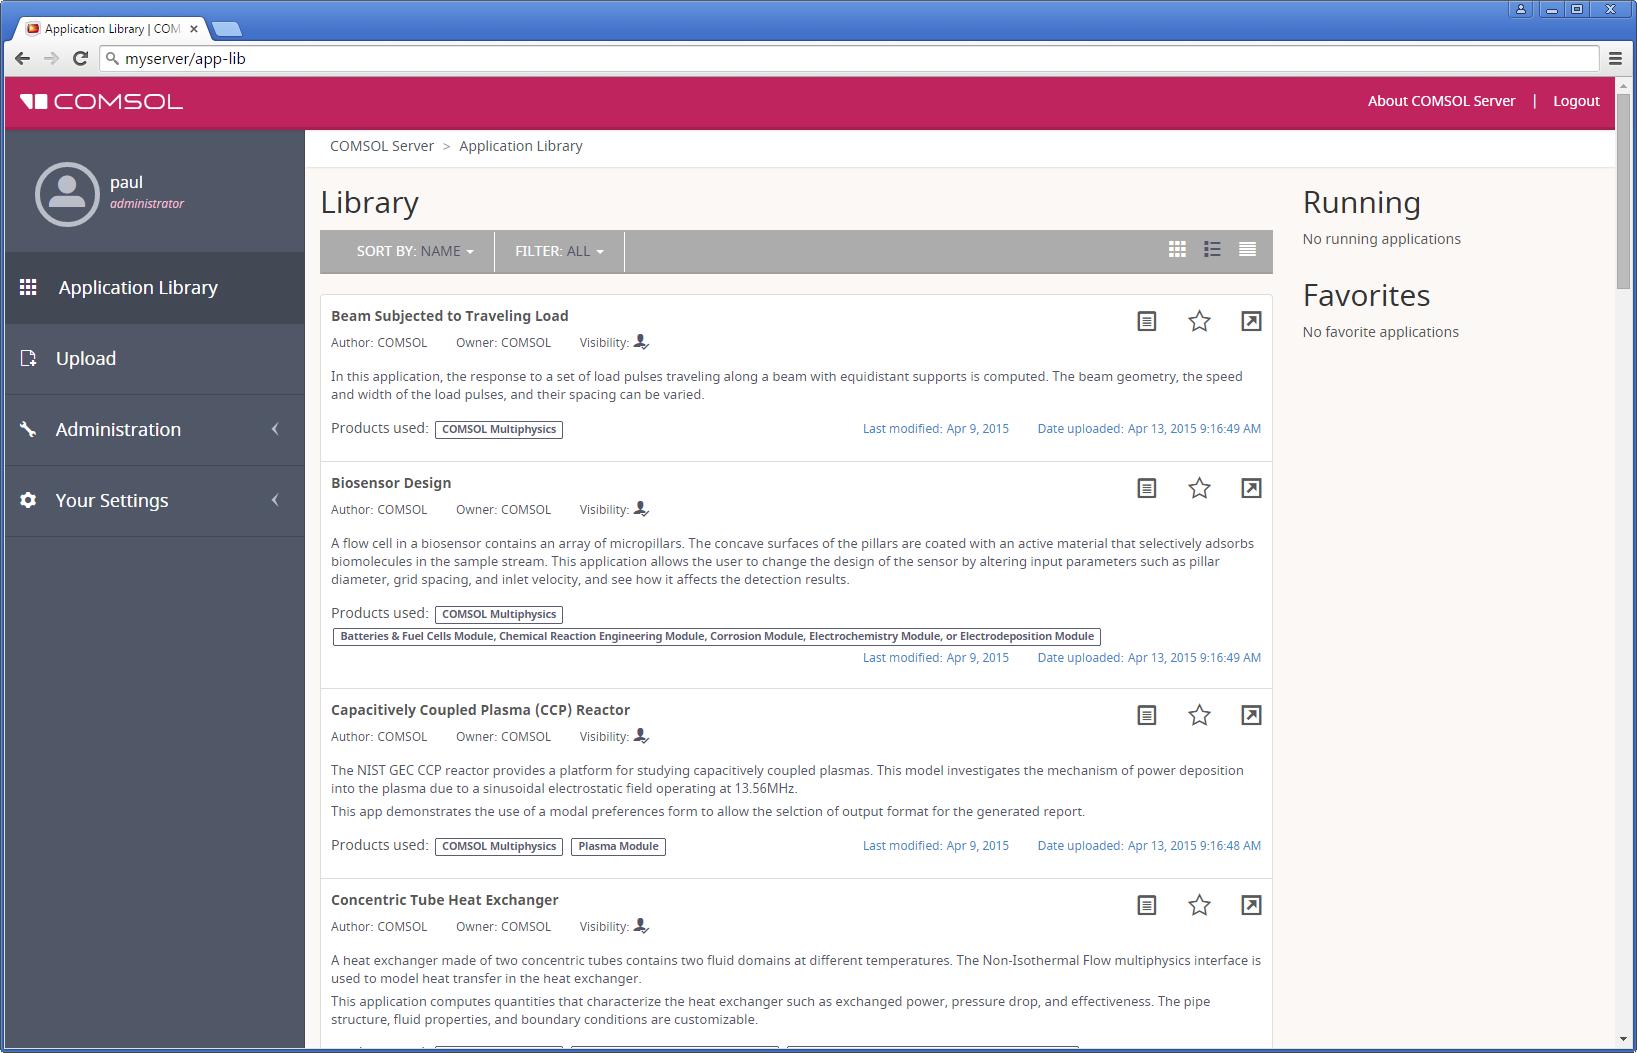 COMSOL Server App 库屏幕截图。